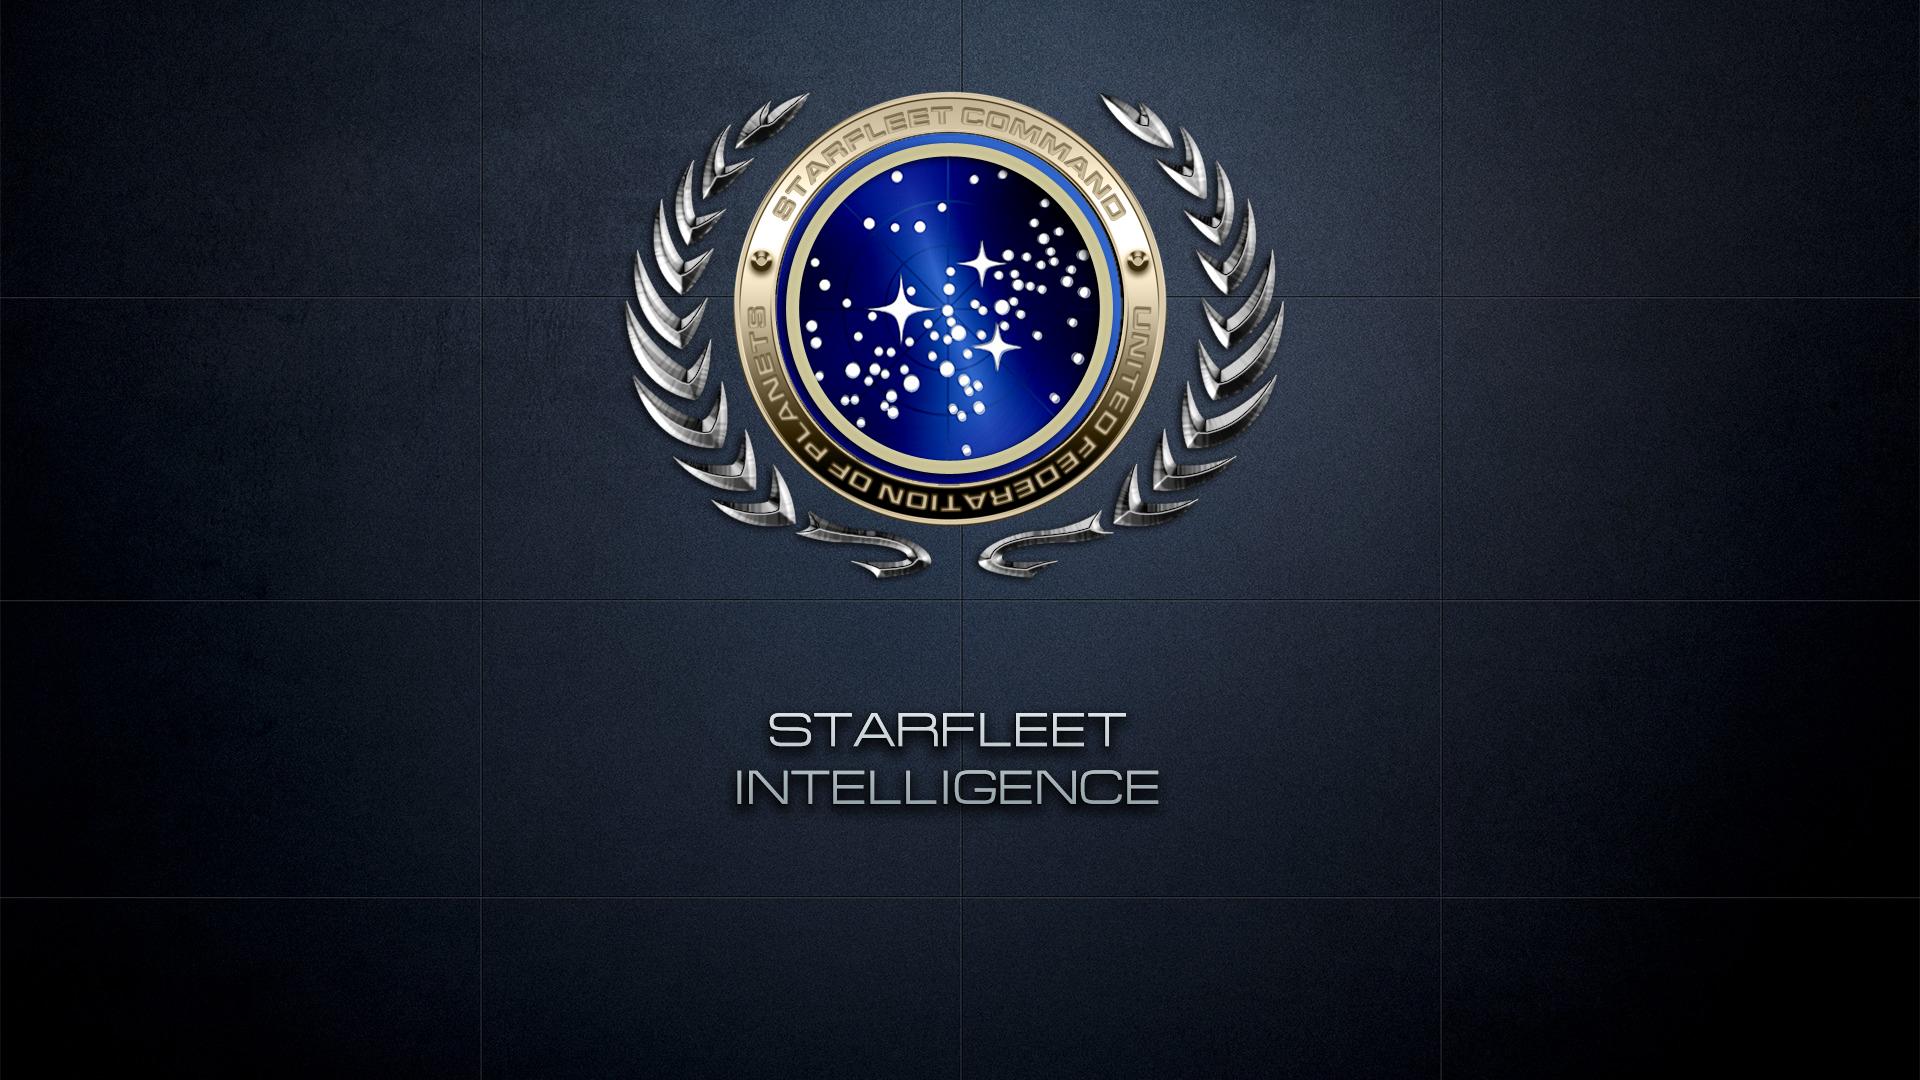 STARFLEET INTELLIGENCE Insignia of the United